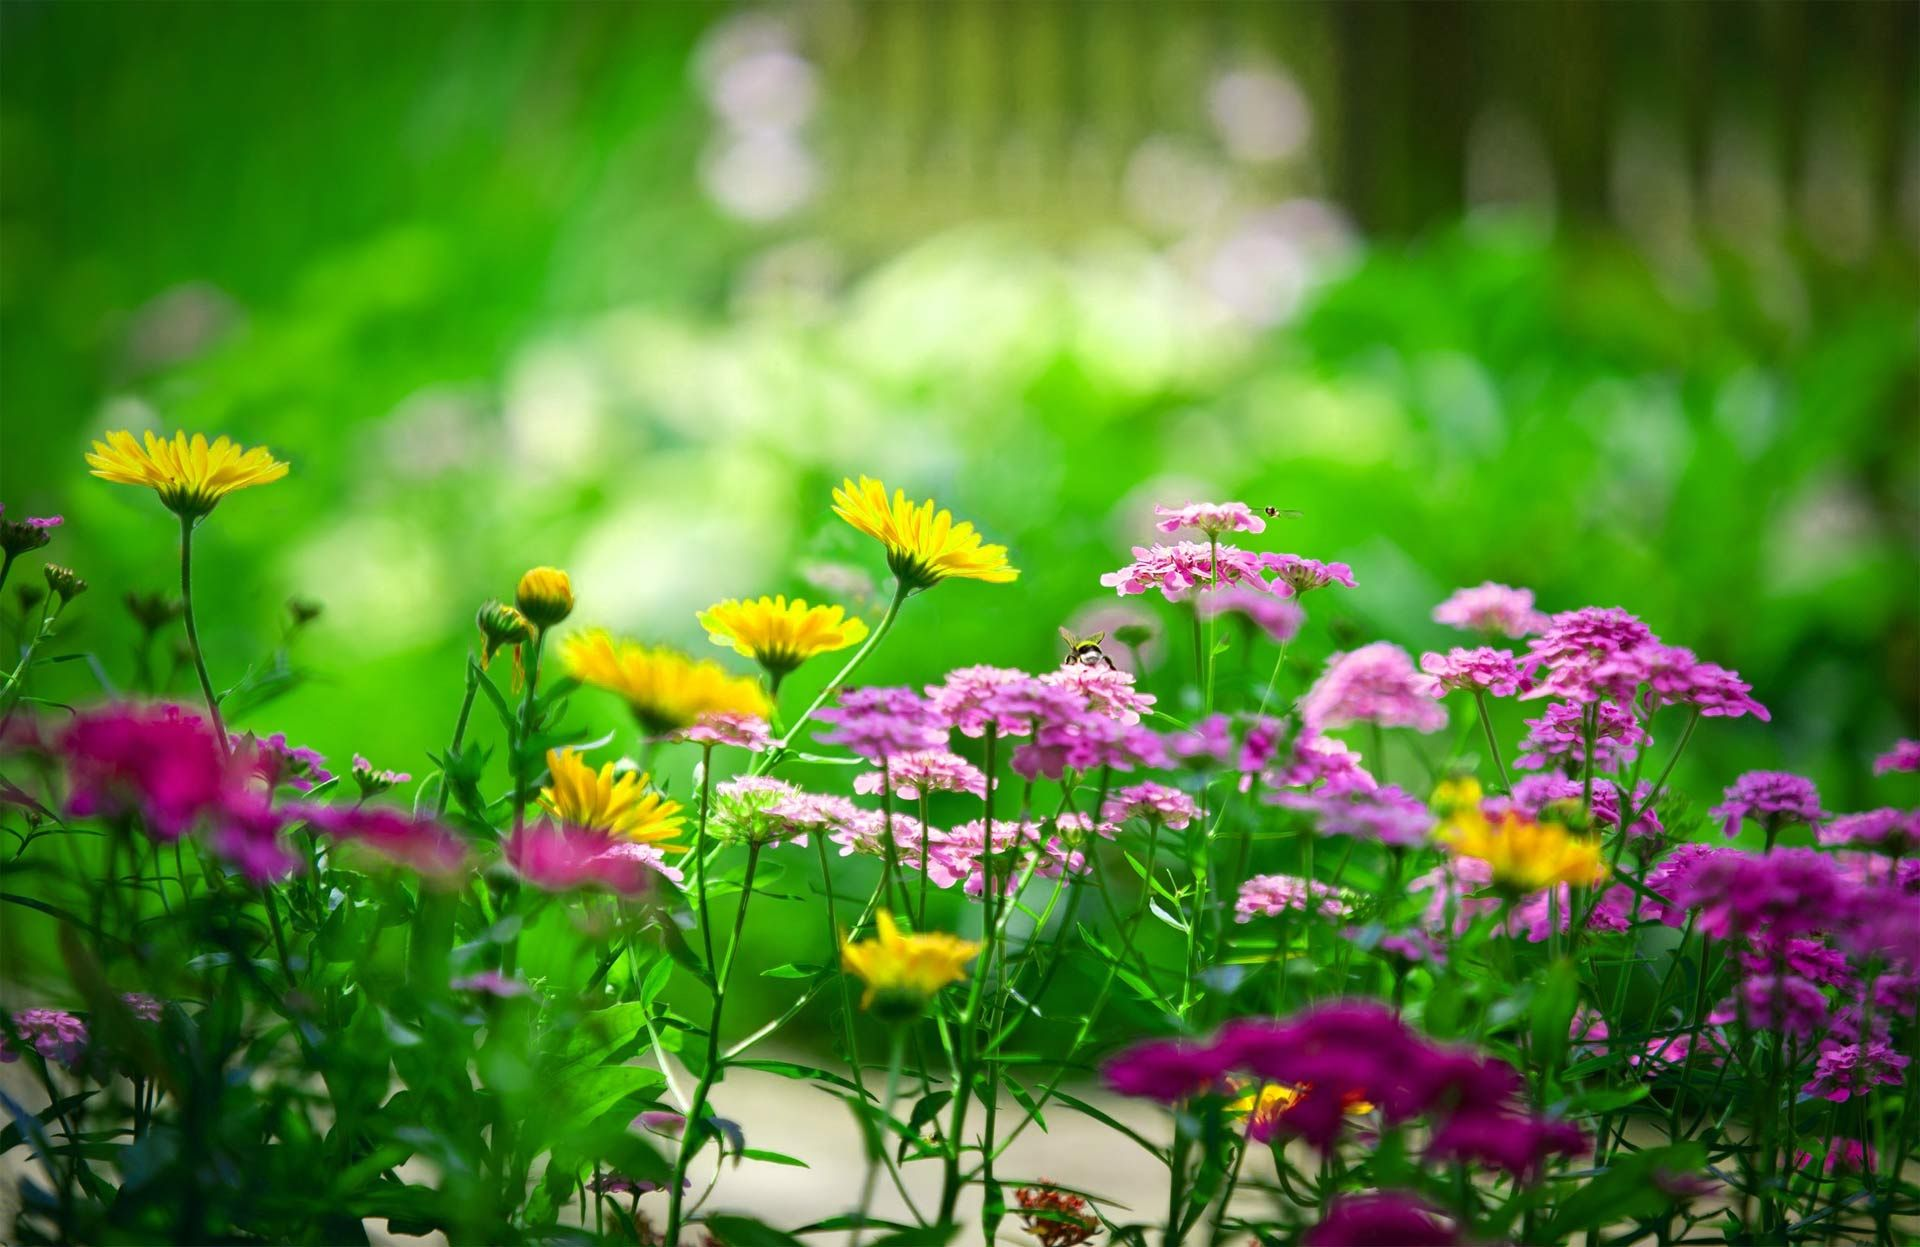 Fondos De Pantalla De Flores Hermosas En Hd Gratis Para